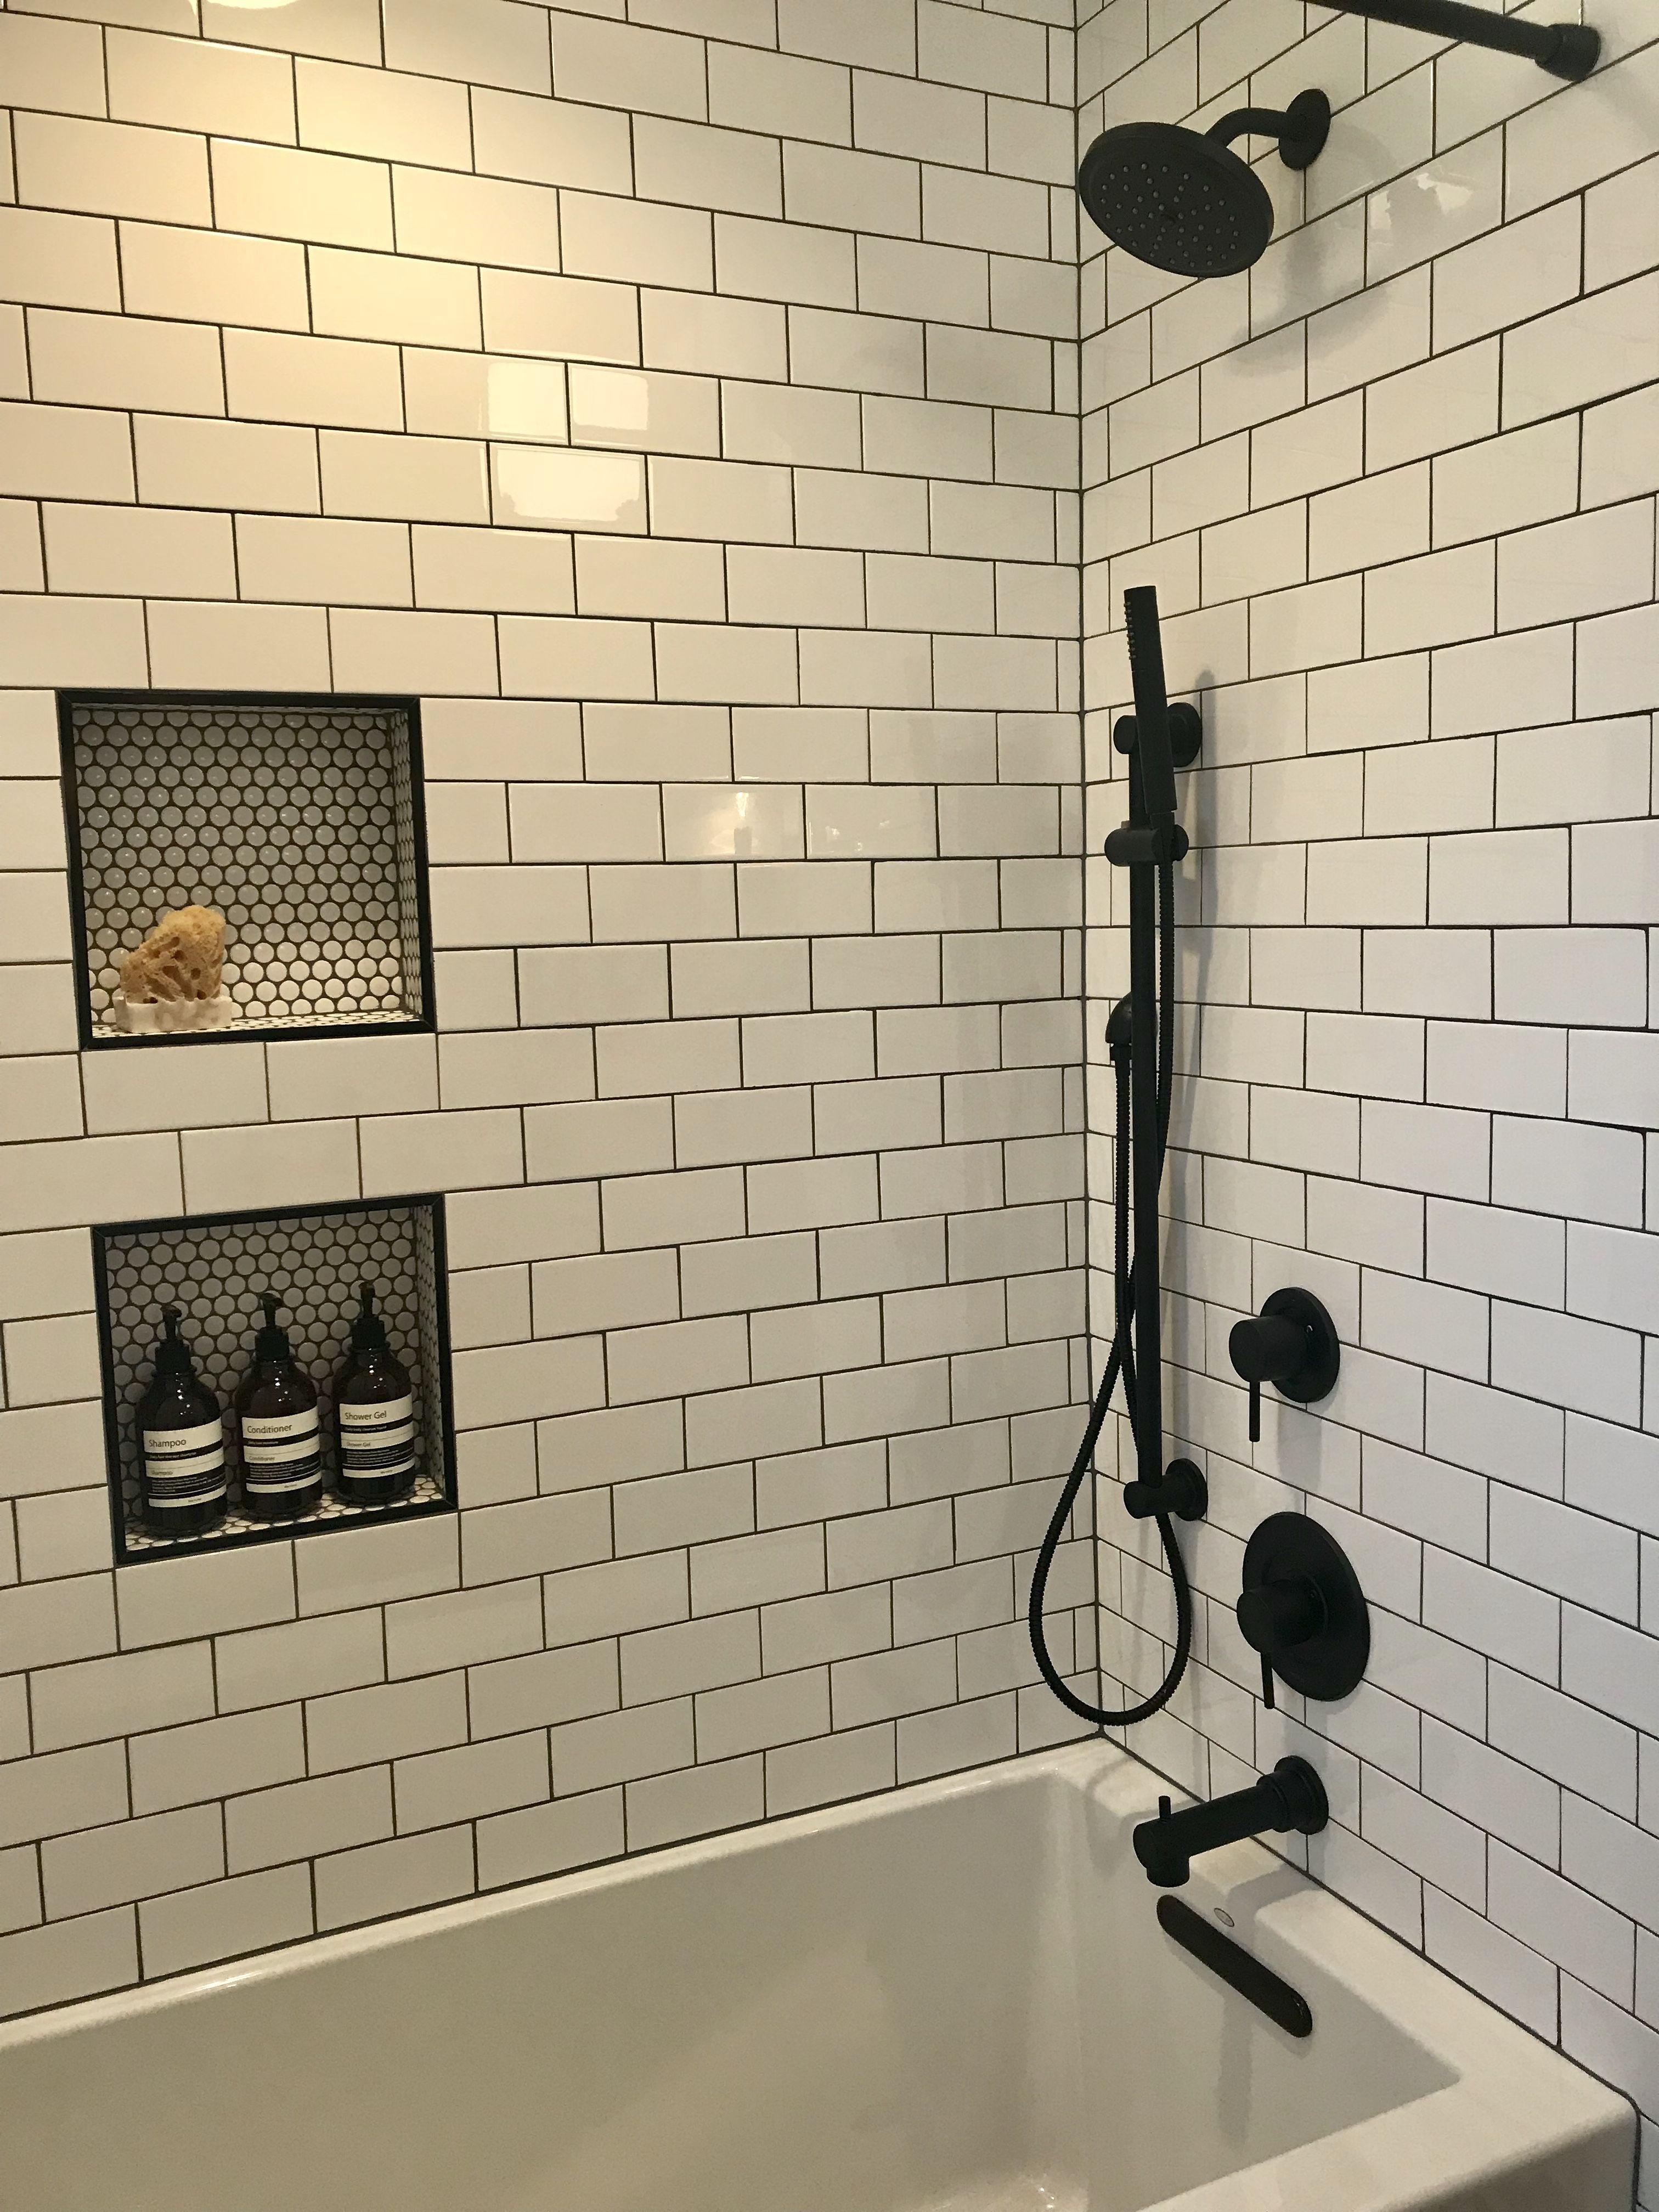 Small Hex Tile In Nook Subway W Grey Grout Kohler Soaking Tub Moen Matte Black Fixtures Bathroom Design Trends Bathroom Trends Bathrooms Remodel